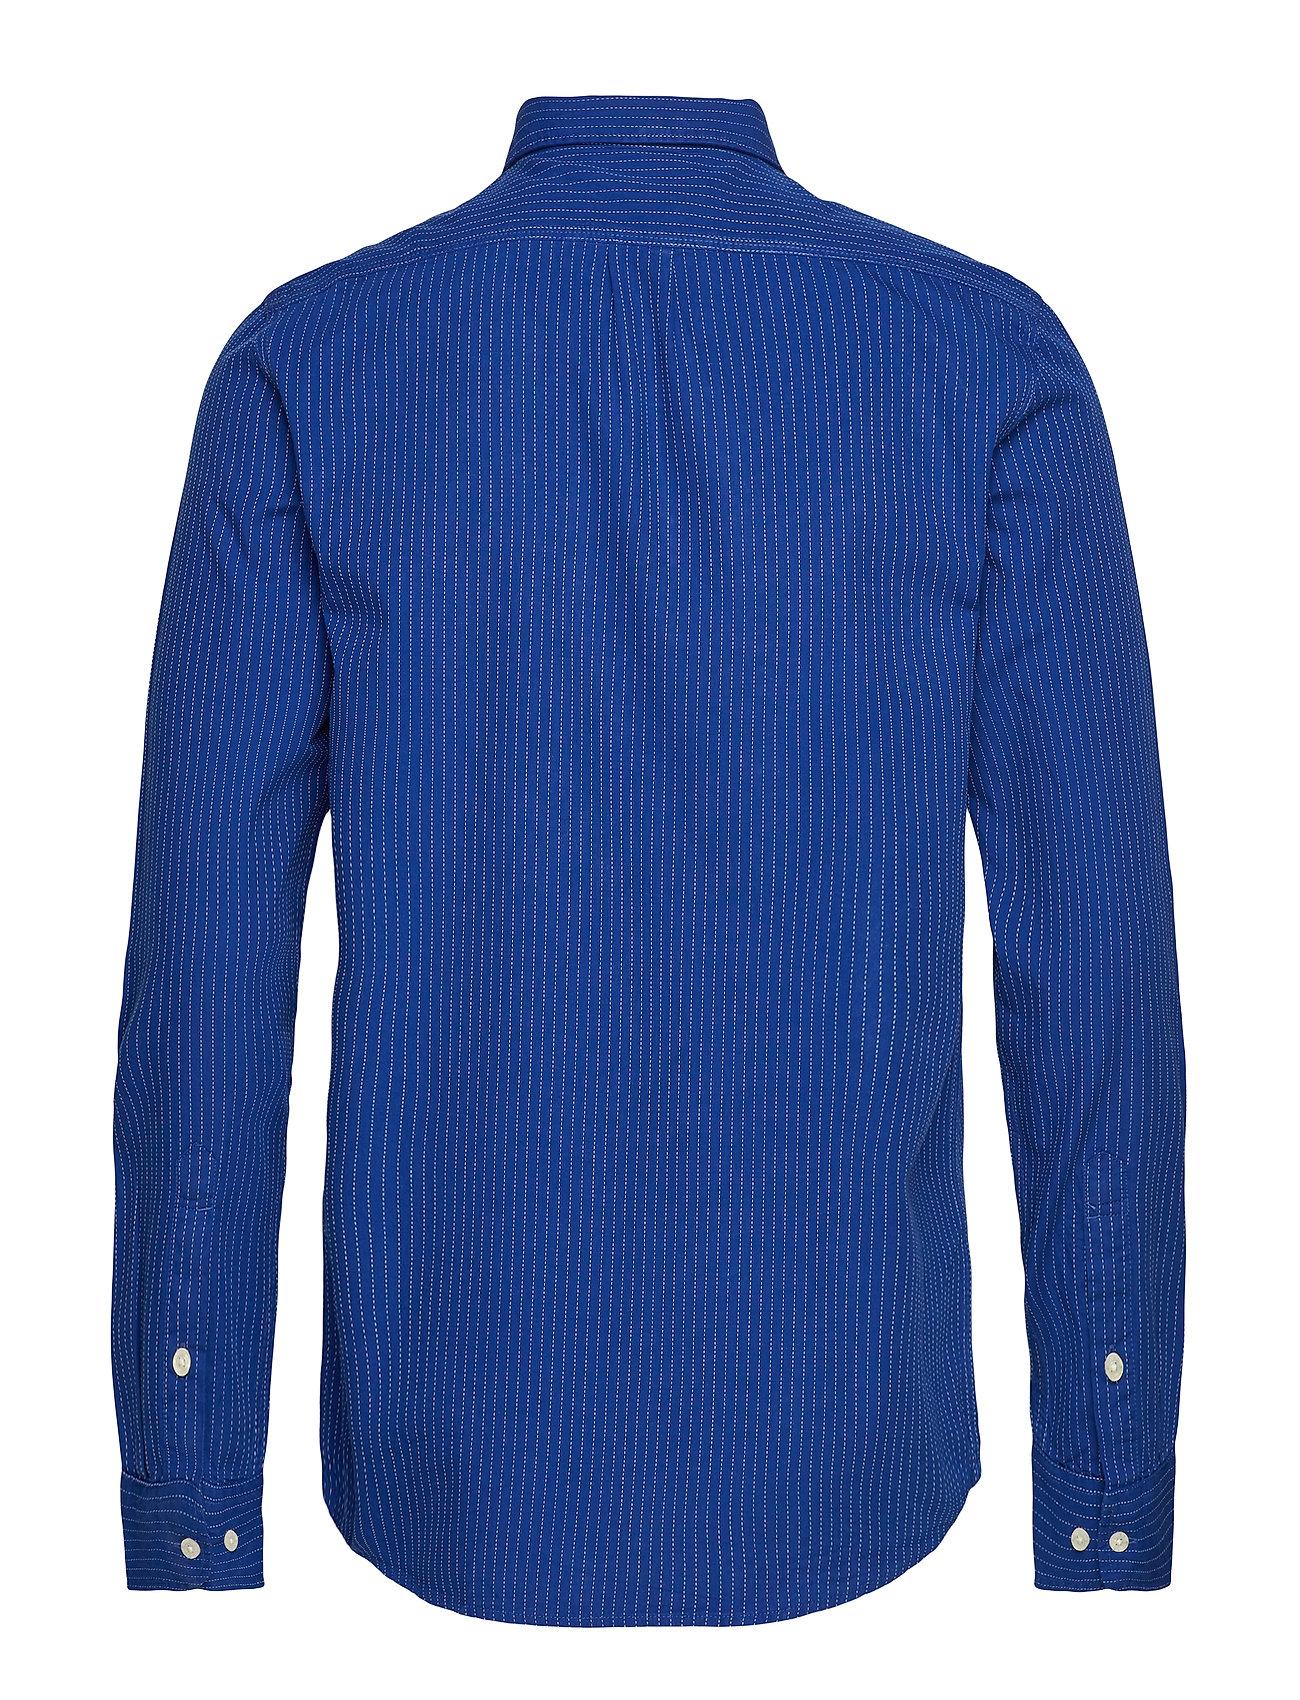 BlueJeans BlueJeans Lee Downfrench Button Button BlueJeans Downfrench Downfrench Button Lee Lee DY2HWEI9